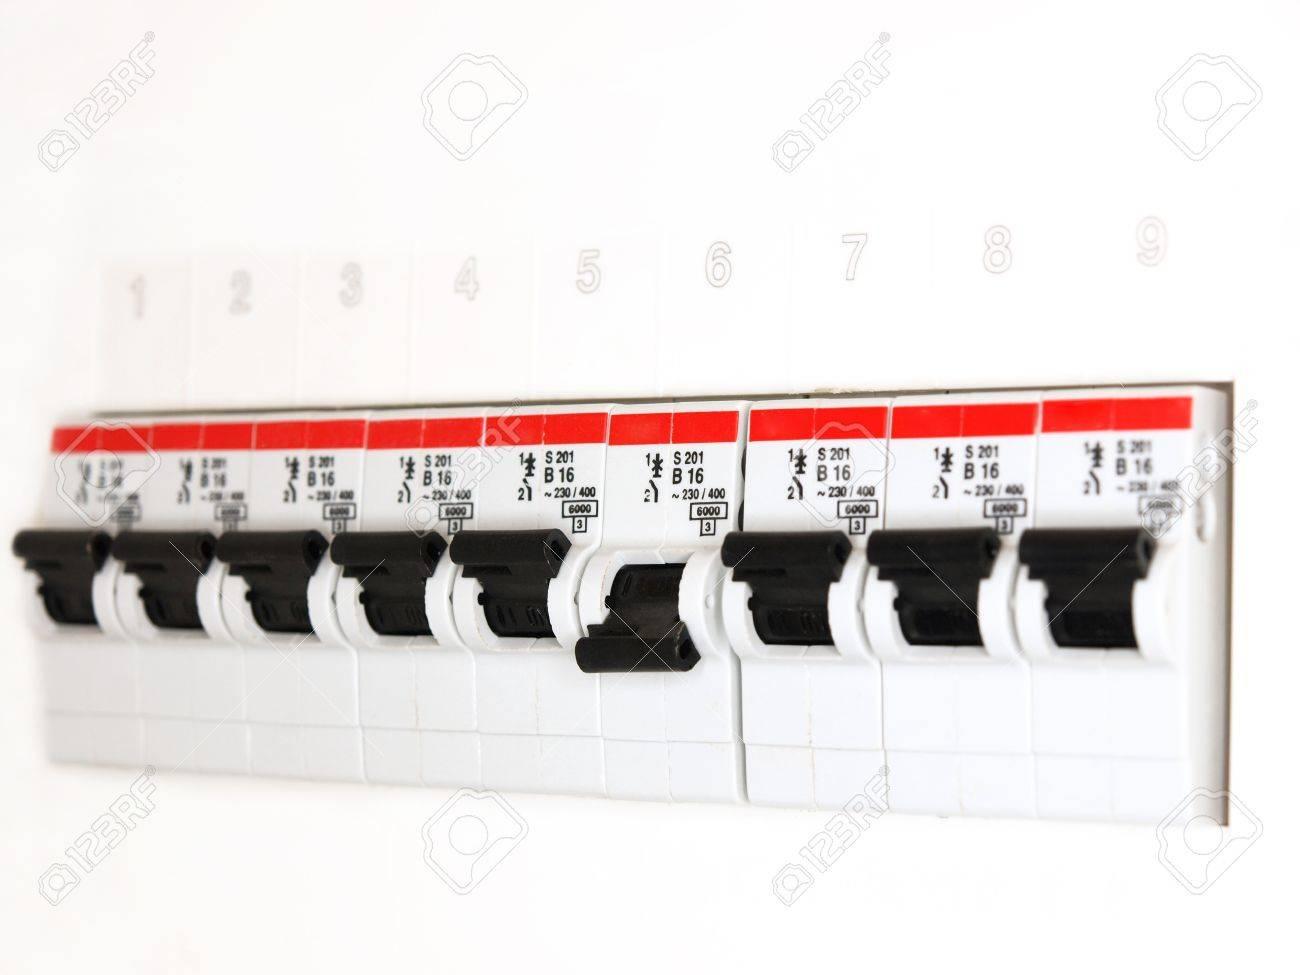 Nett Elektroroller Drosselschaltplan Galerie - Der Schaltplan ...